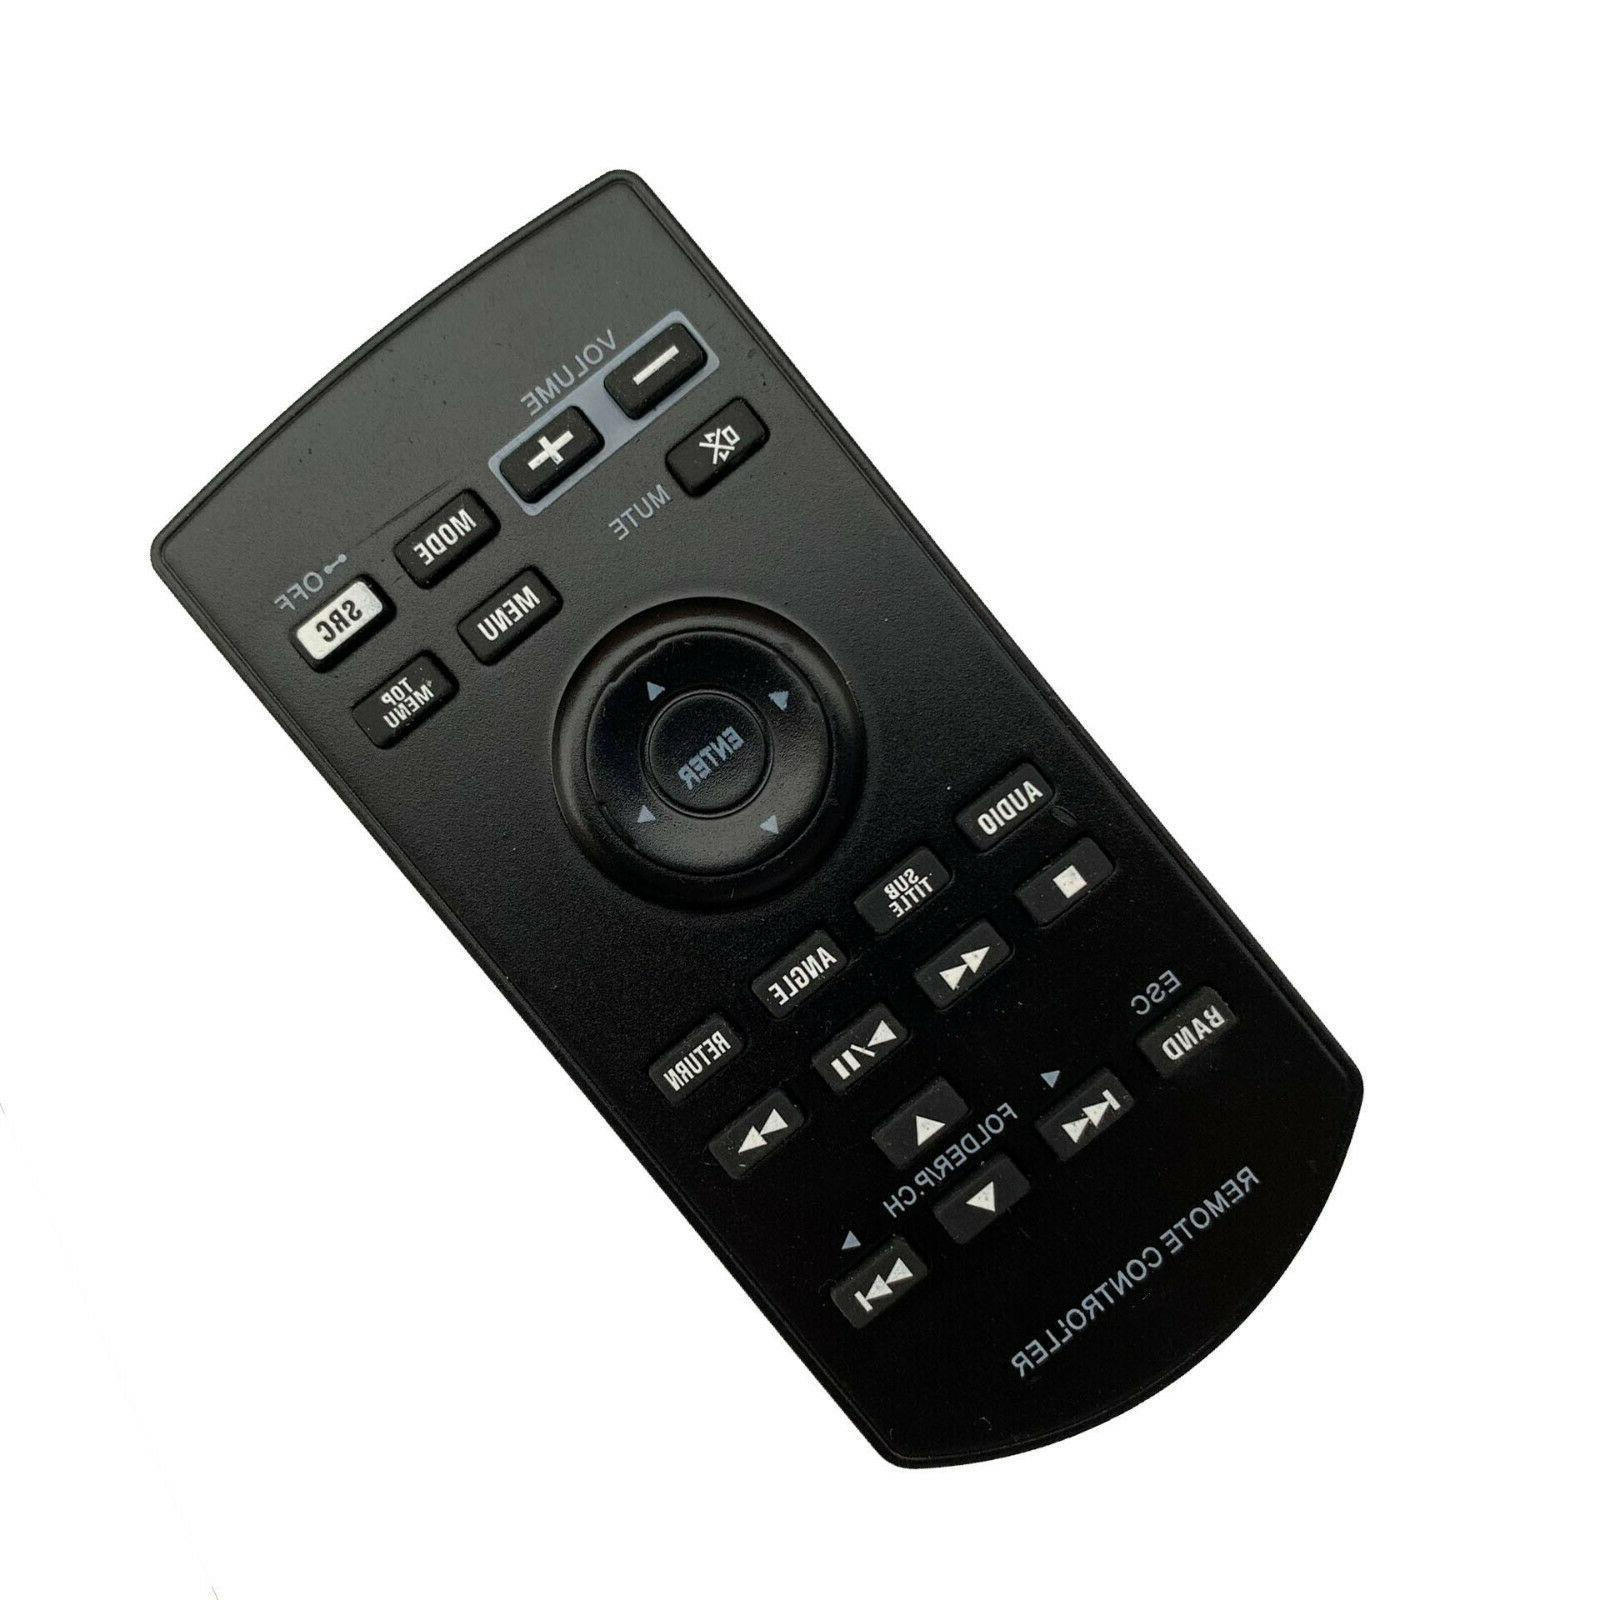 Remote For Pioneer AVH-200BT AVH-280BT Car Stereo System